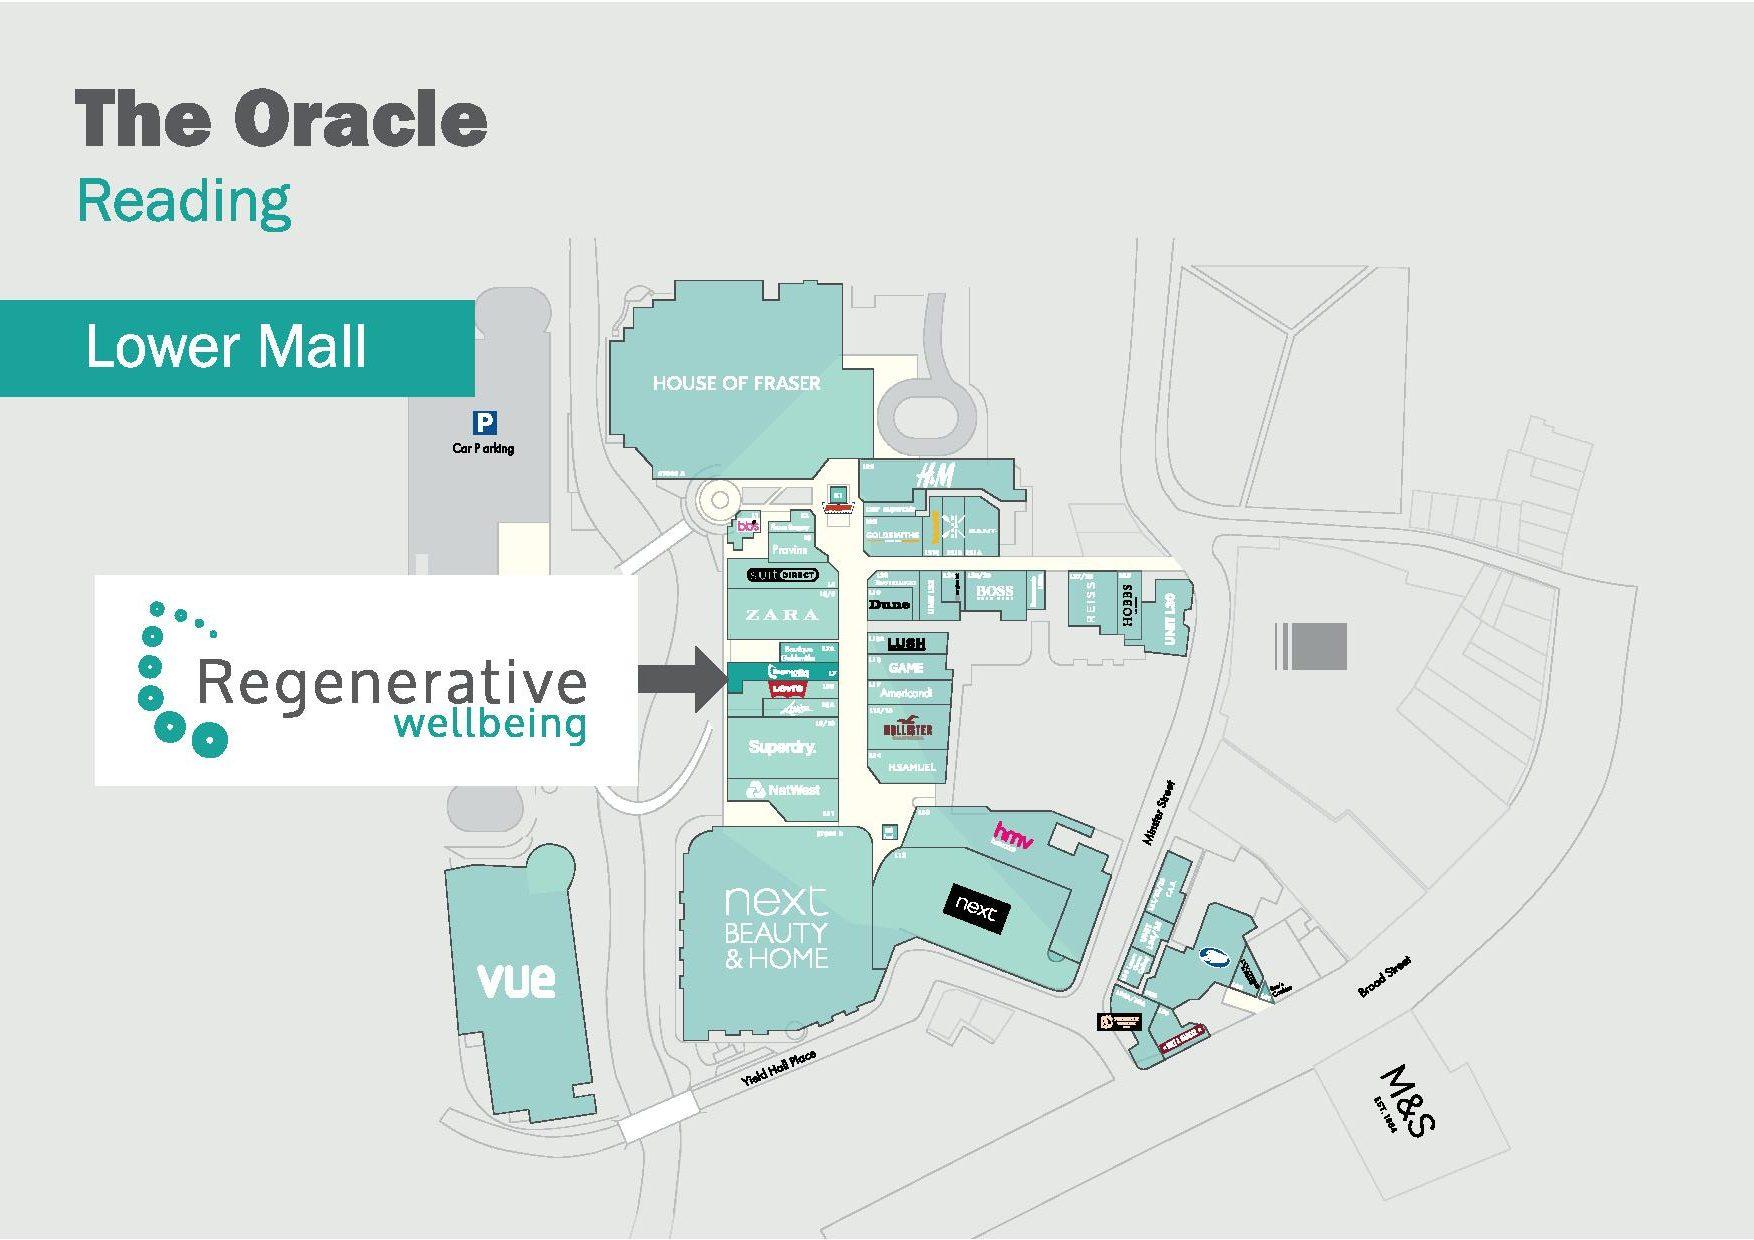 Oracle map regen wellness